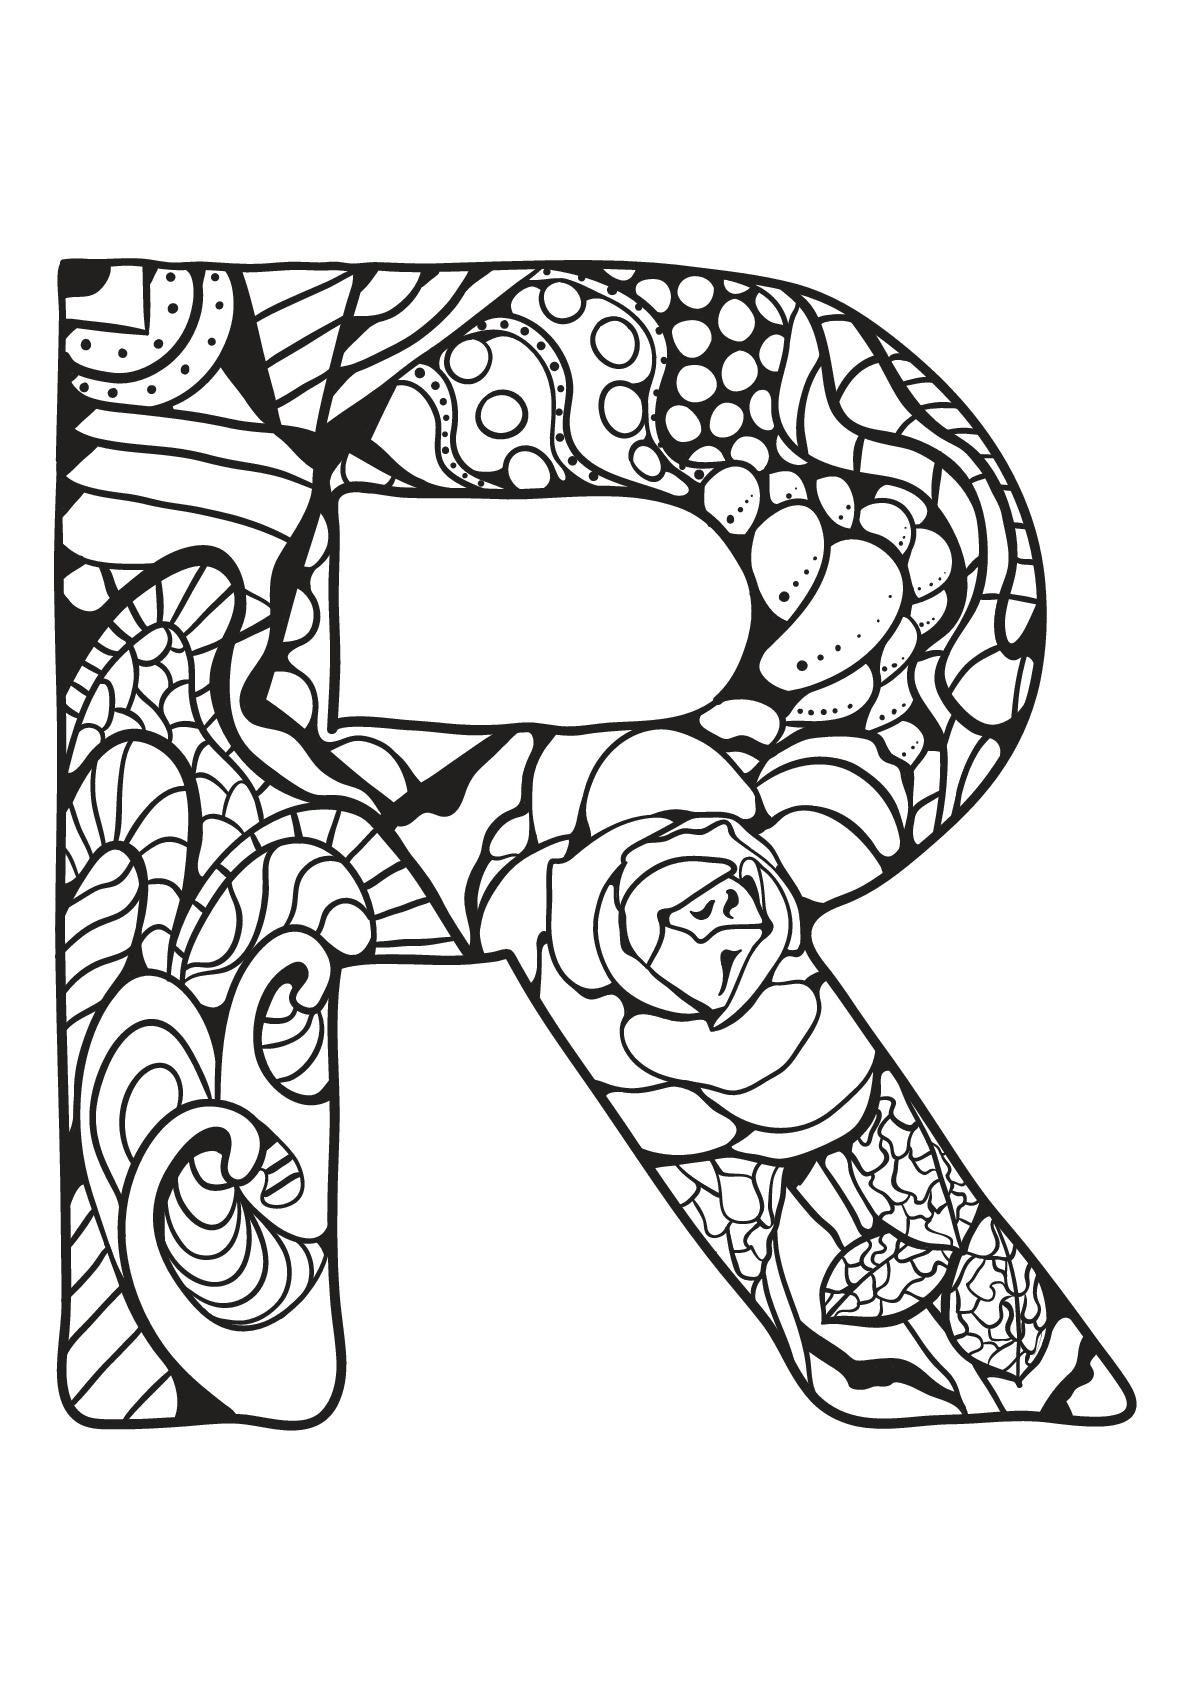 Alphabet To Color For Kids R